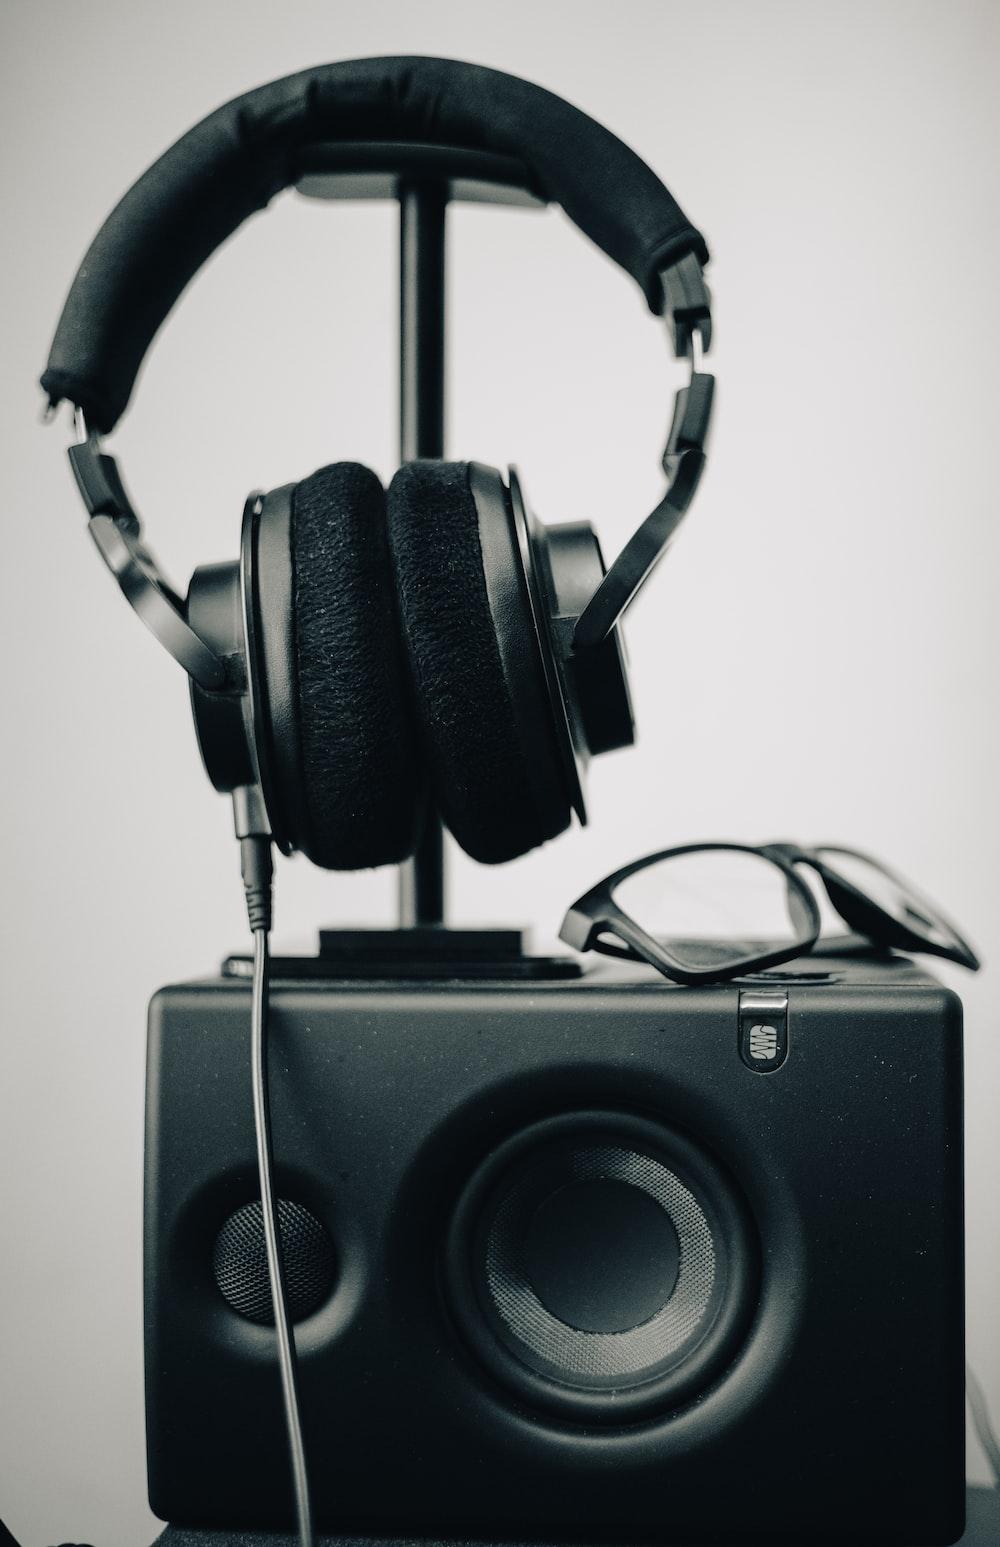 black and silver headphones on black speaker